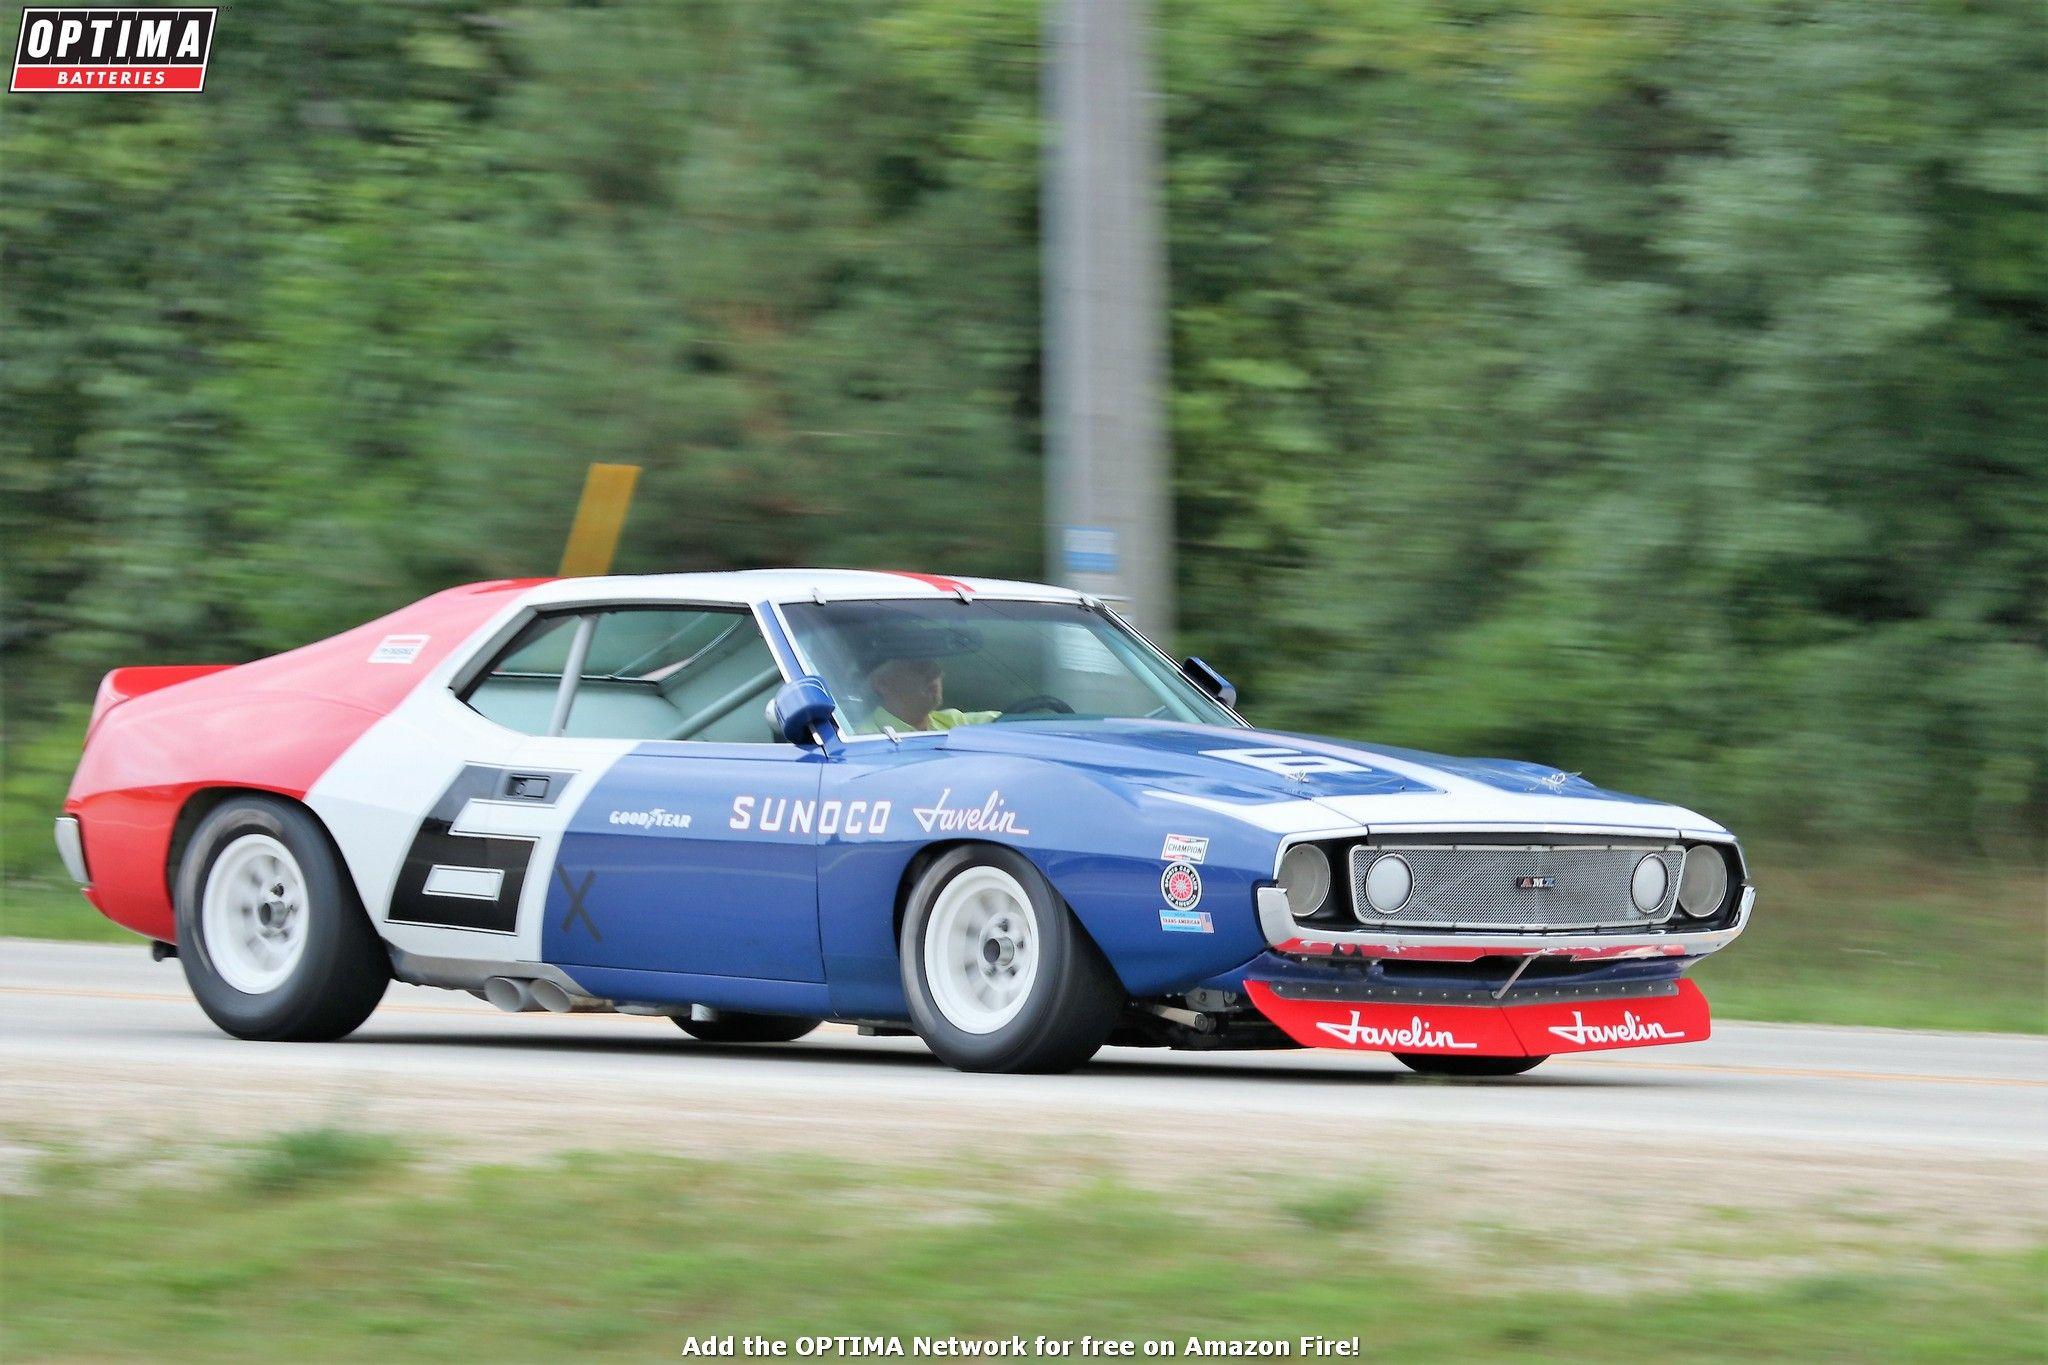 1971 AMC Javelin Trans Am vintage race car driving into